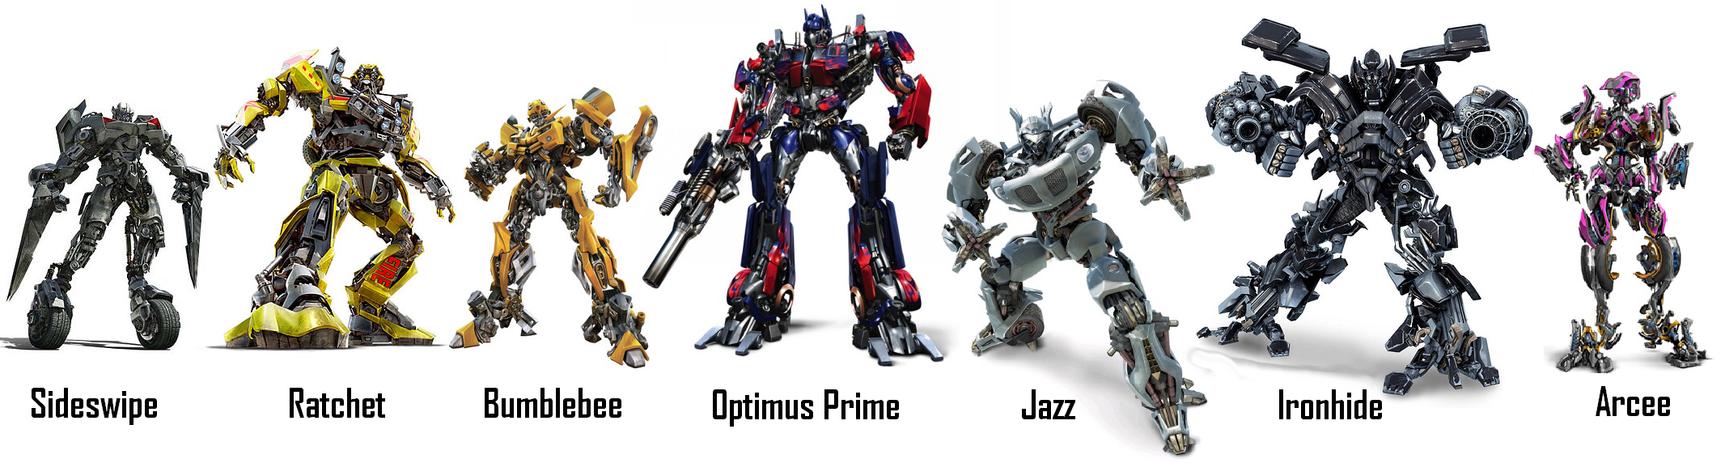 My Autobot Team By Skyscream1